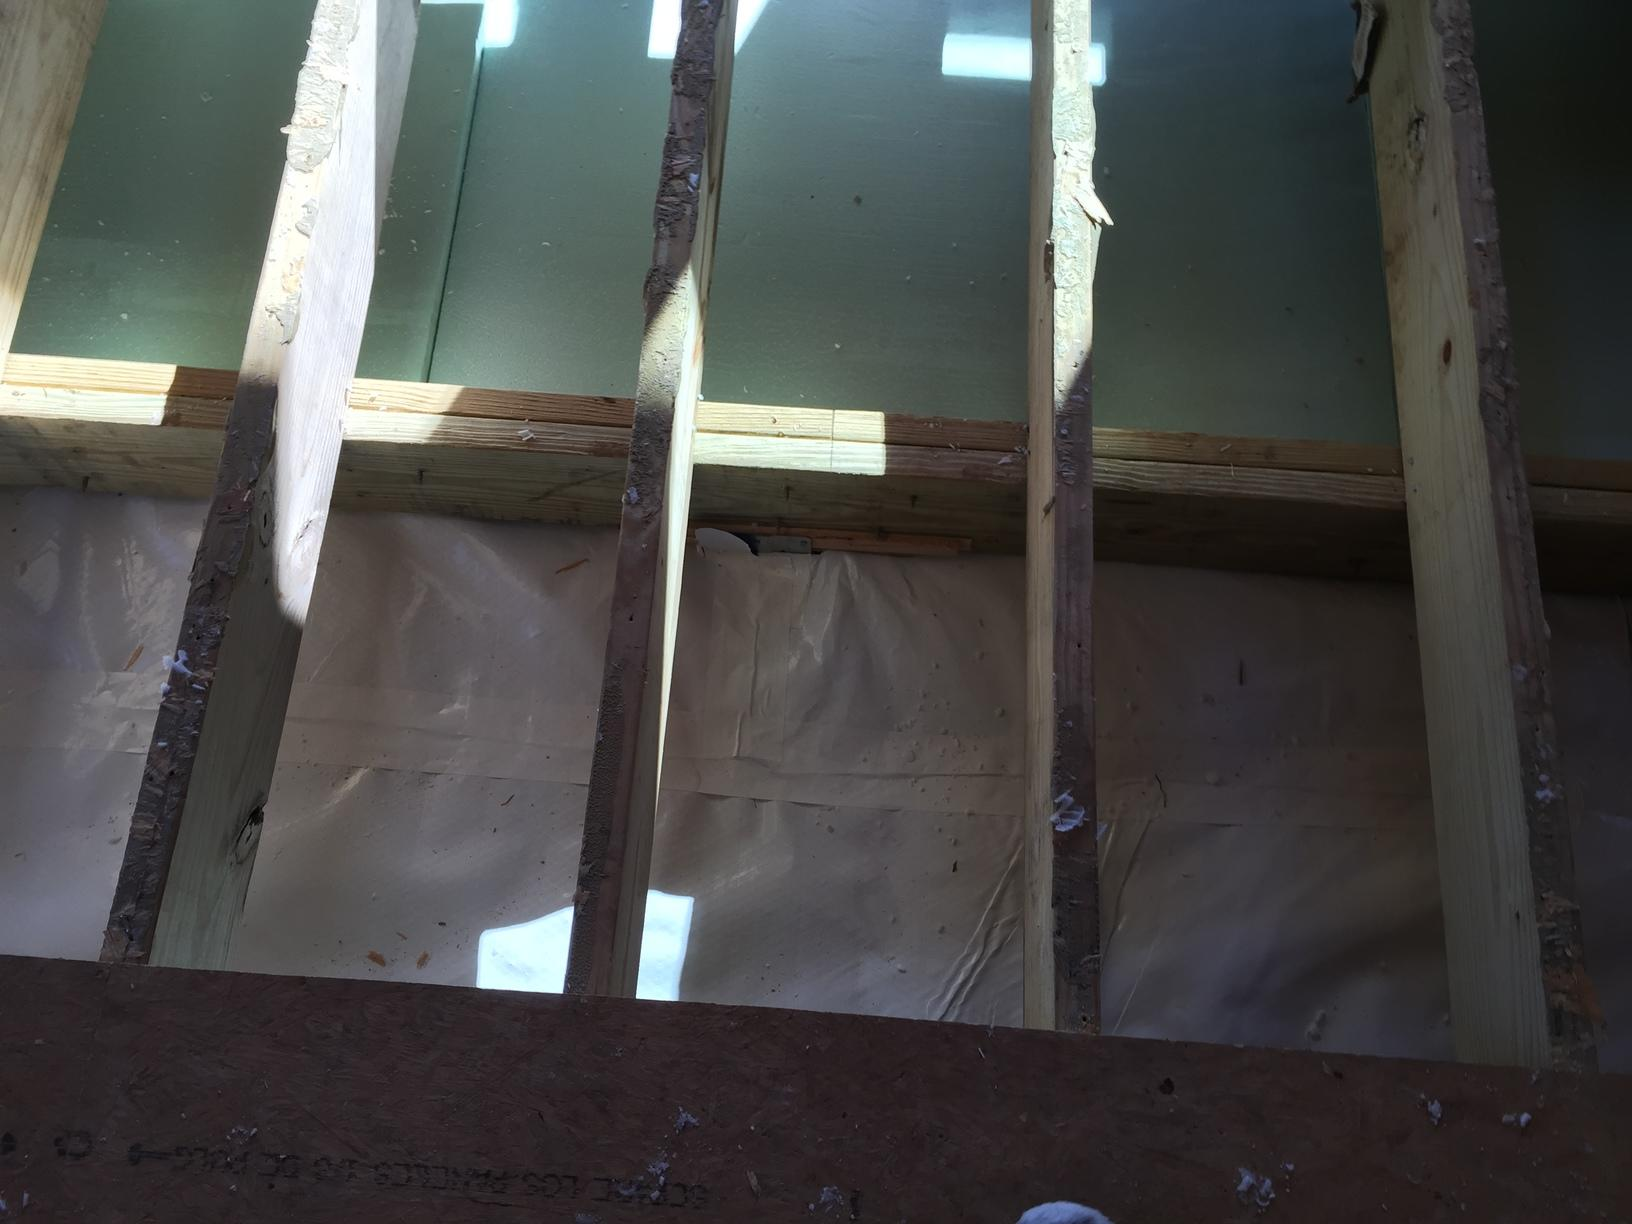 Cleanspace under flooring